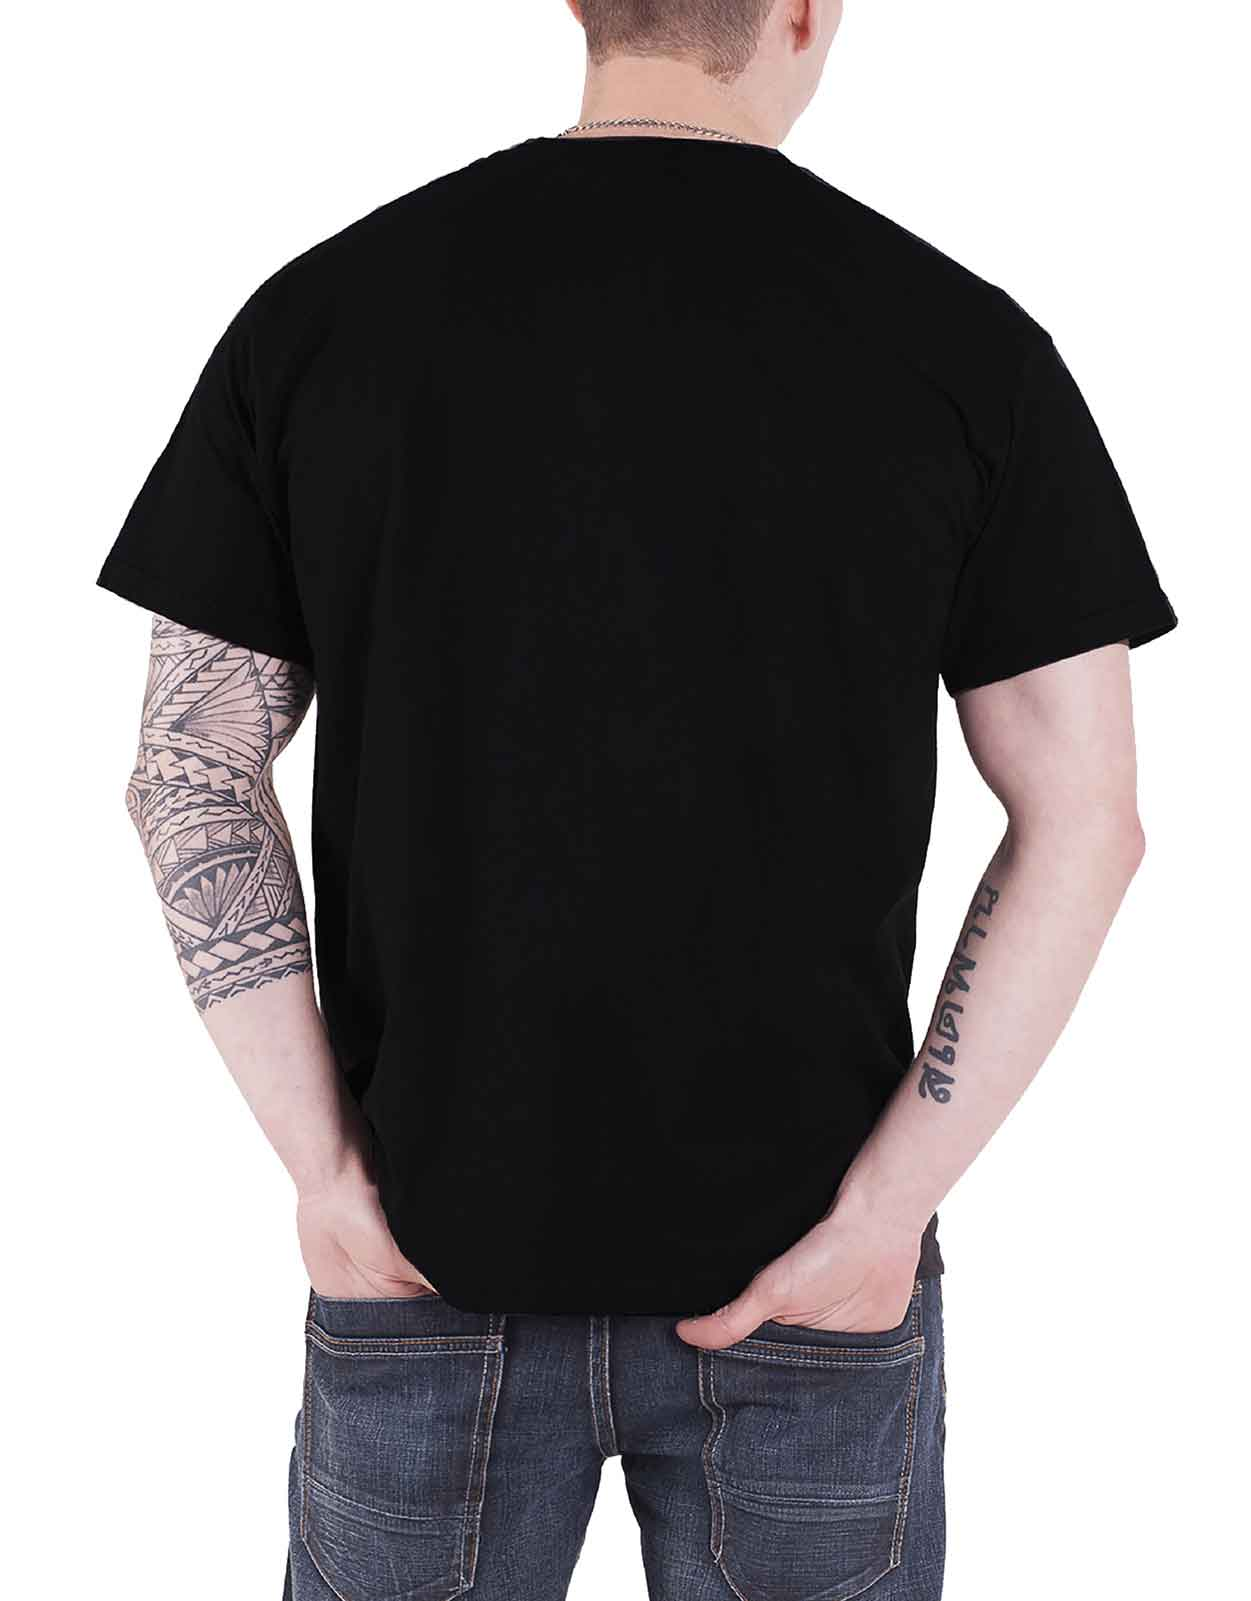 Motorhead-T-Shirt-Lemmy-RIP-England-warpig-clean-your-clock-official-new-mens Indexbild 9